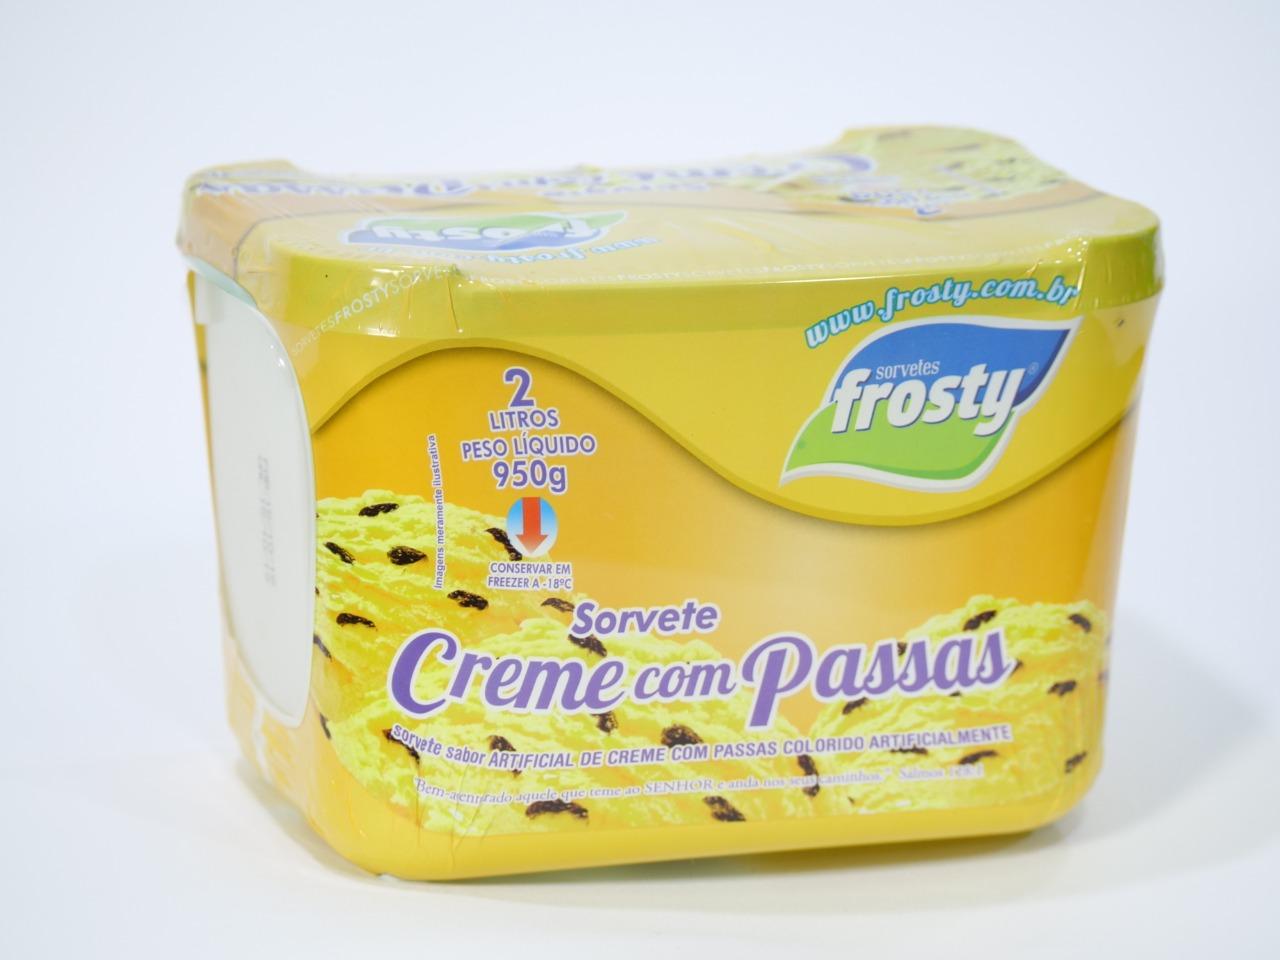 1 Pote de Sorvete Frosty 2L de R$12,90 por R$9,99